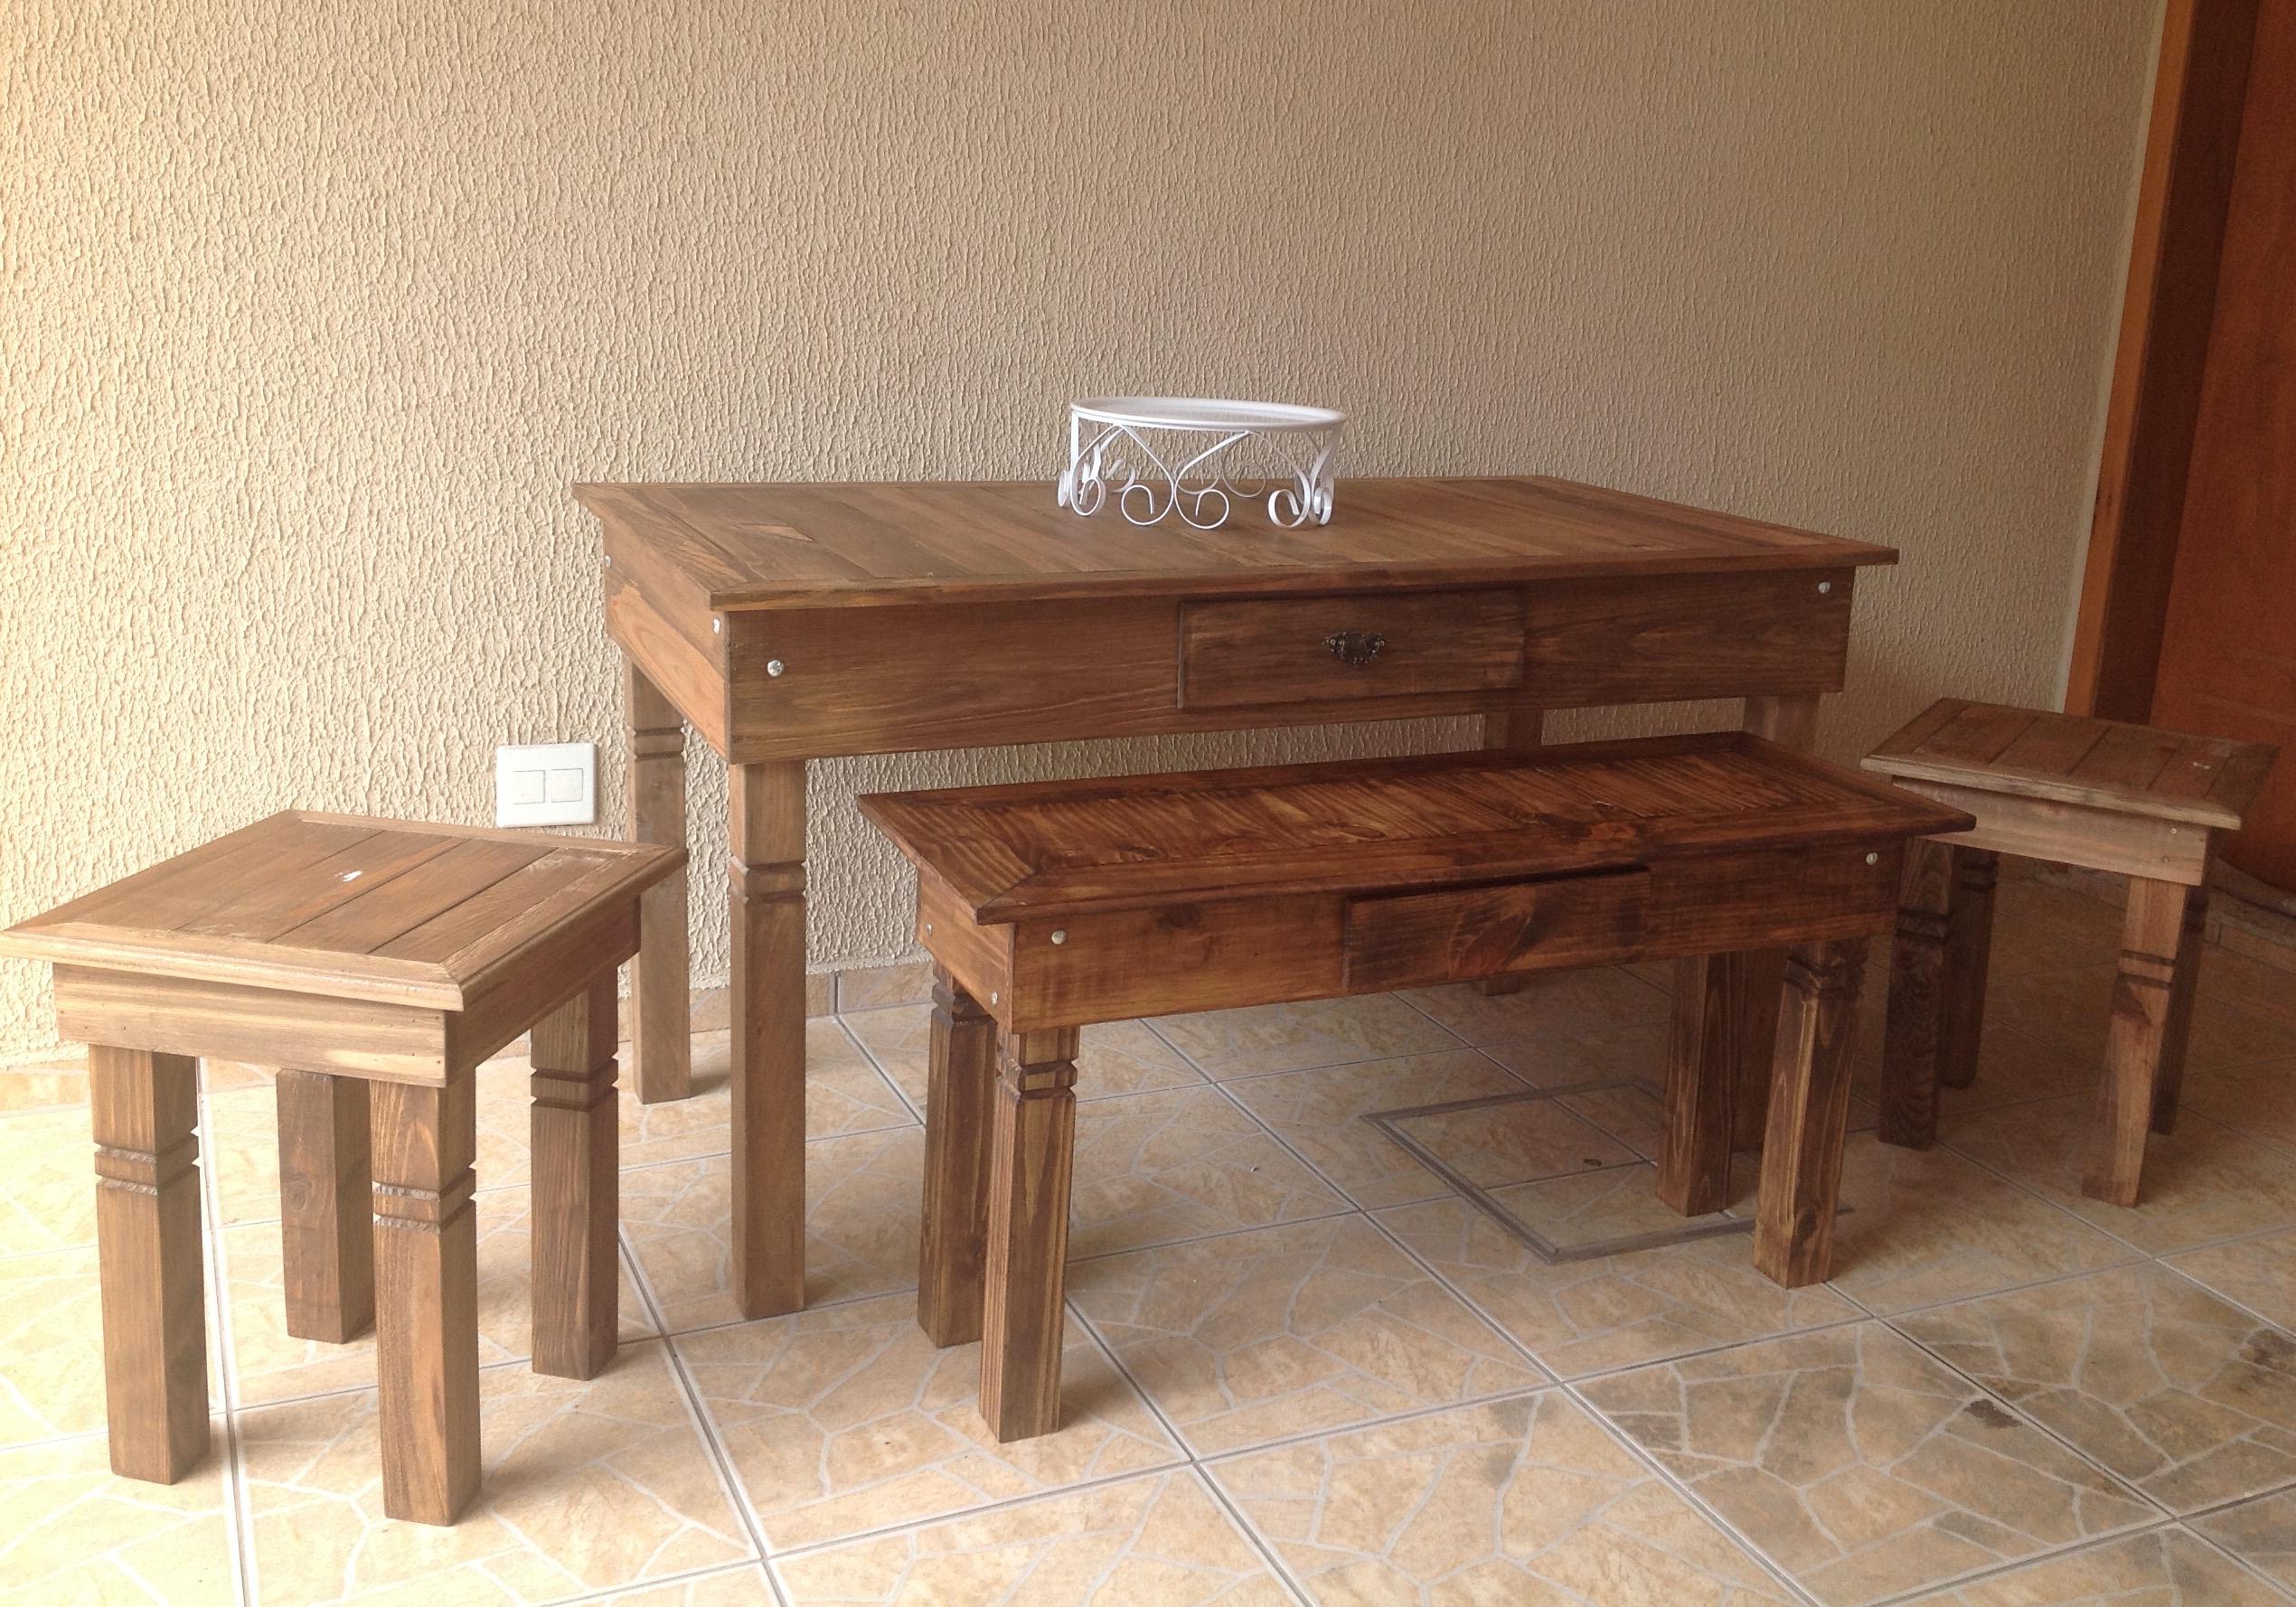 Loca o kit de mesa r stica lana festas e decora es elo7 - Mesa madera rustica ...